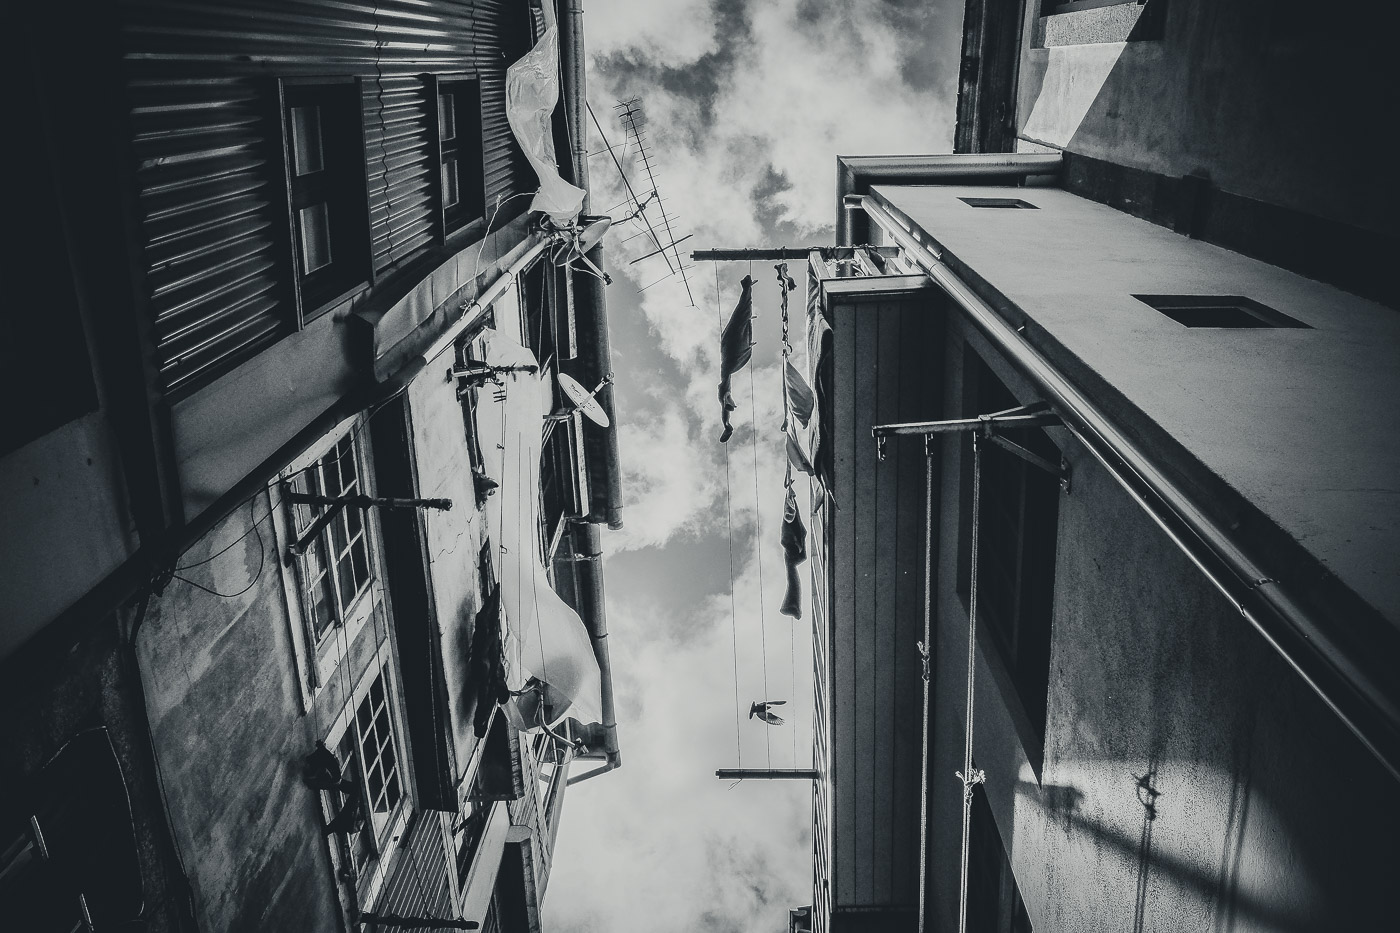 hb images - Porto - b-w street laundry_